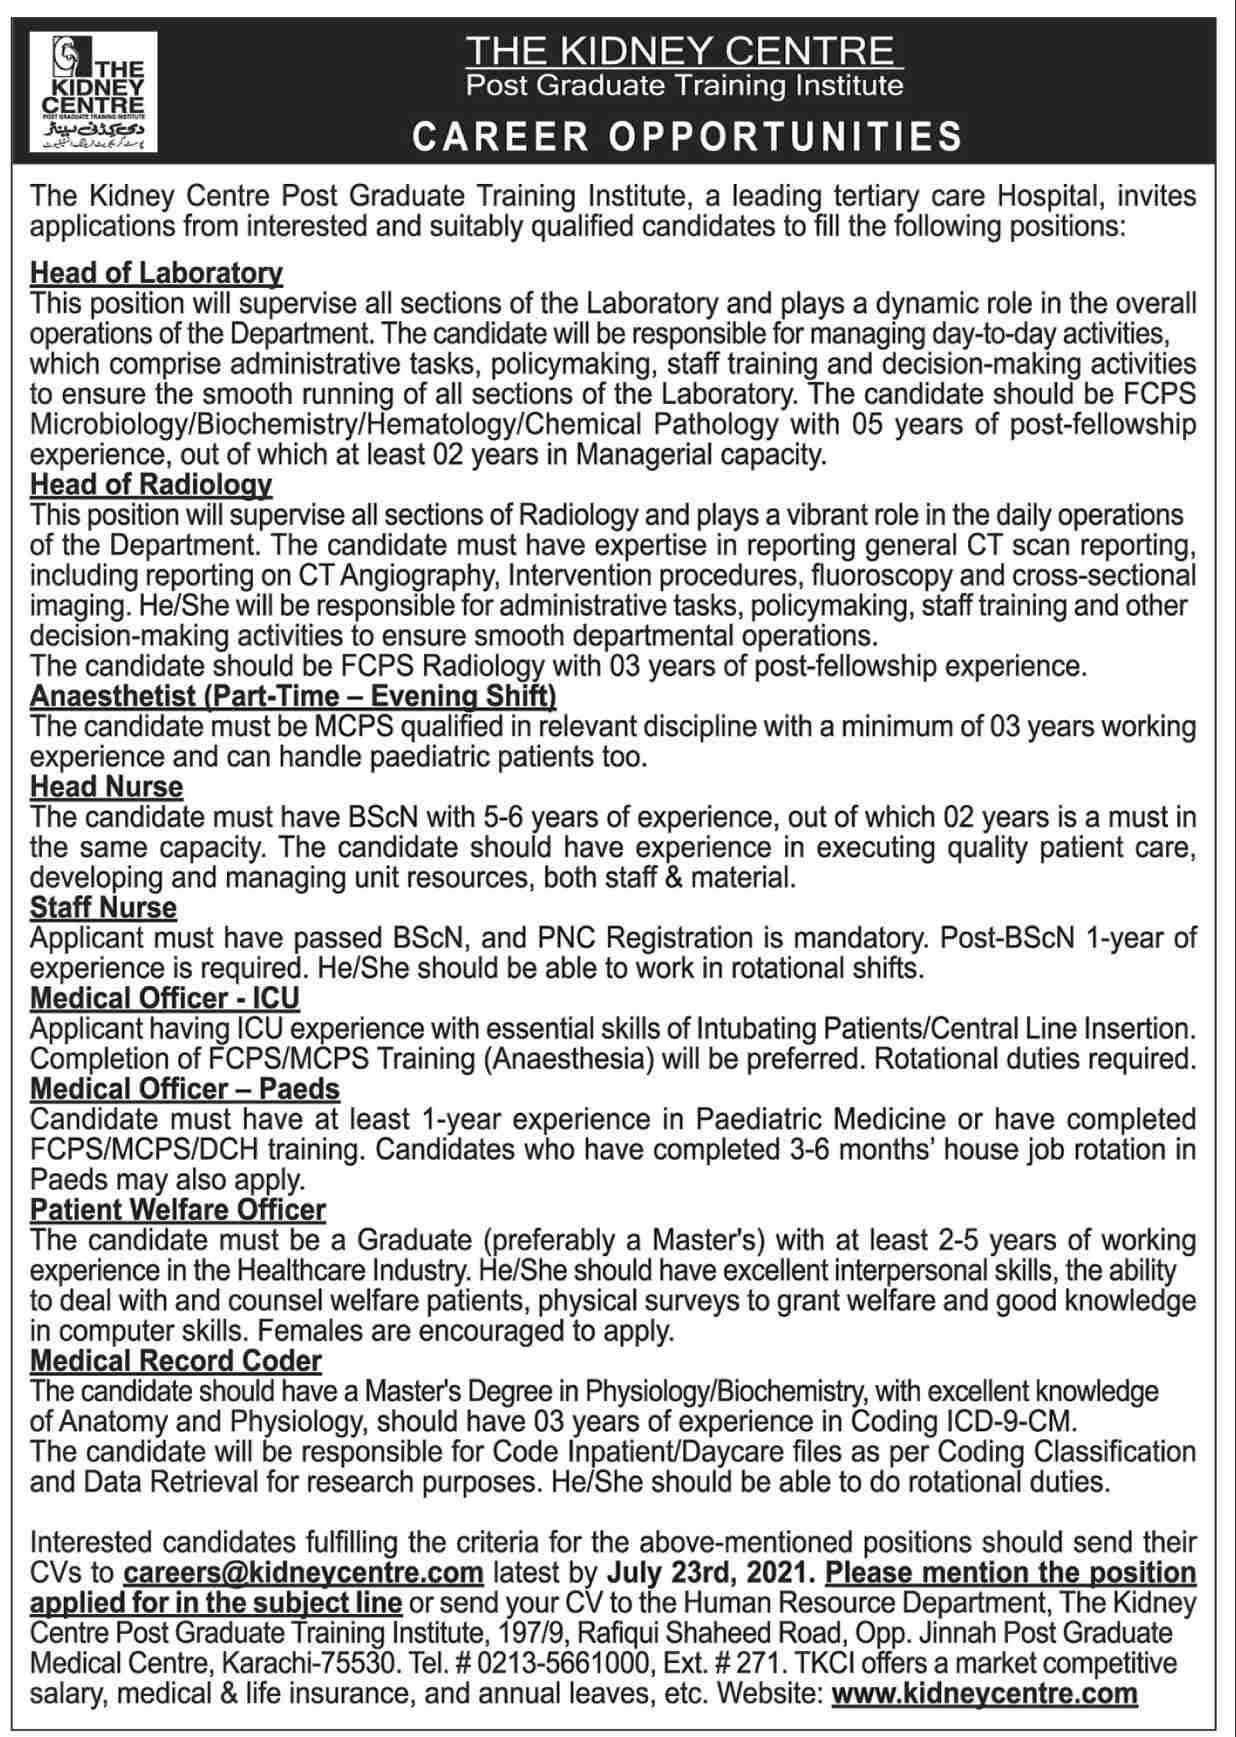 Kidney Center Post Graduate Training Institute Jobs in Karachi 2021